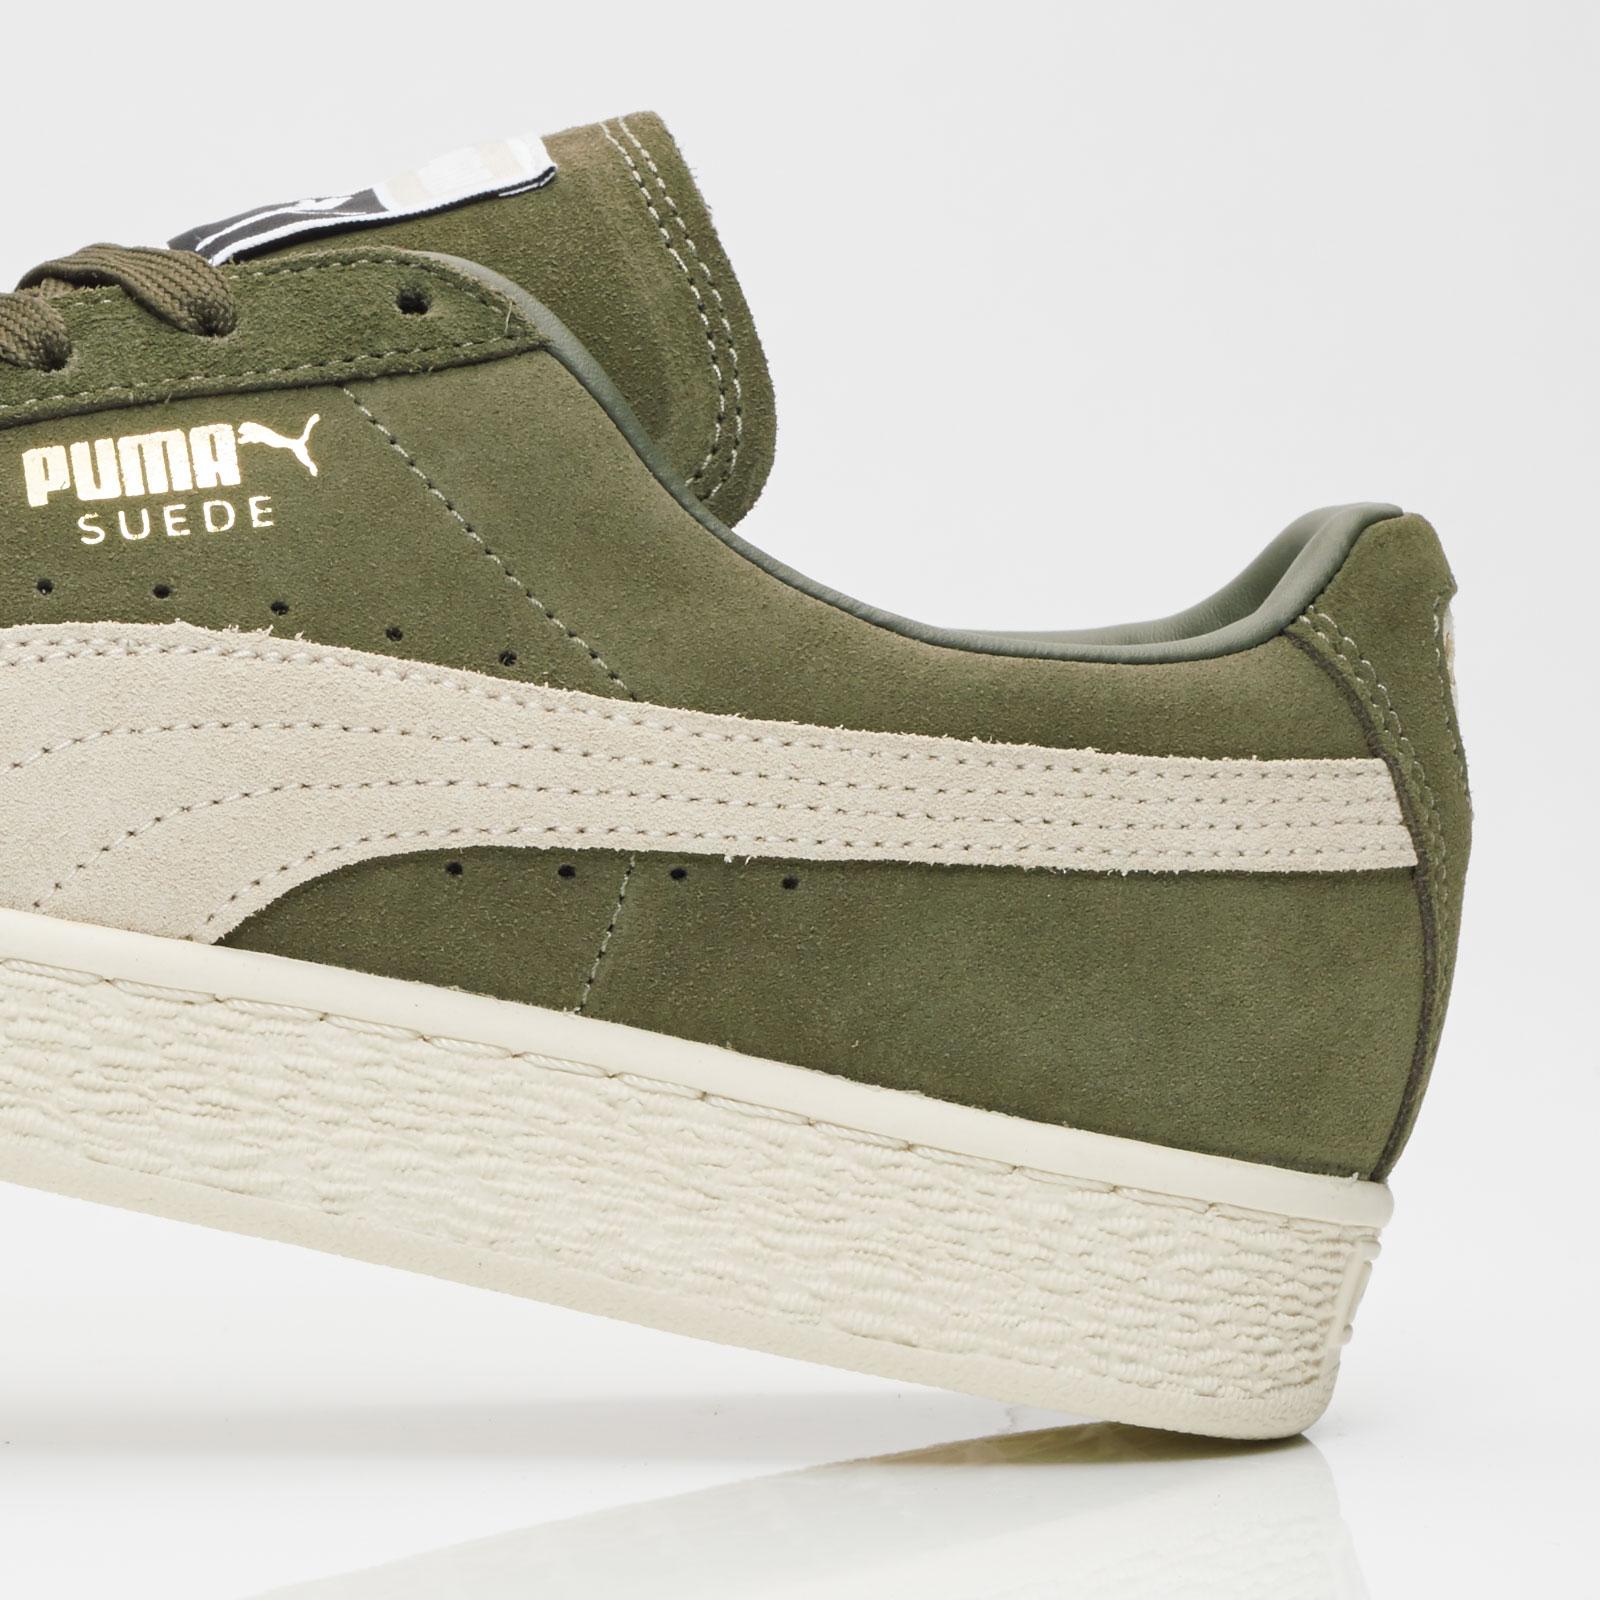 144b1341af20 Puma Suede Classic + - 363242-27 - Sneakersnstuff